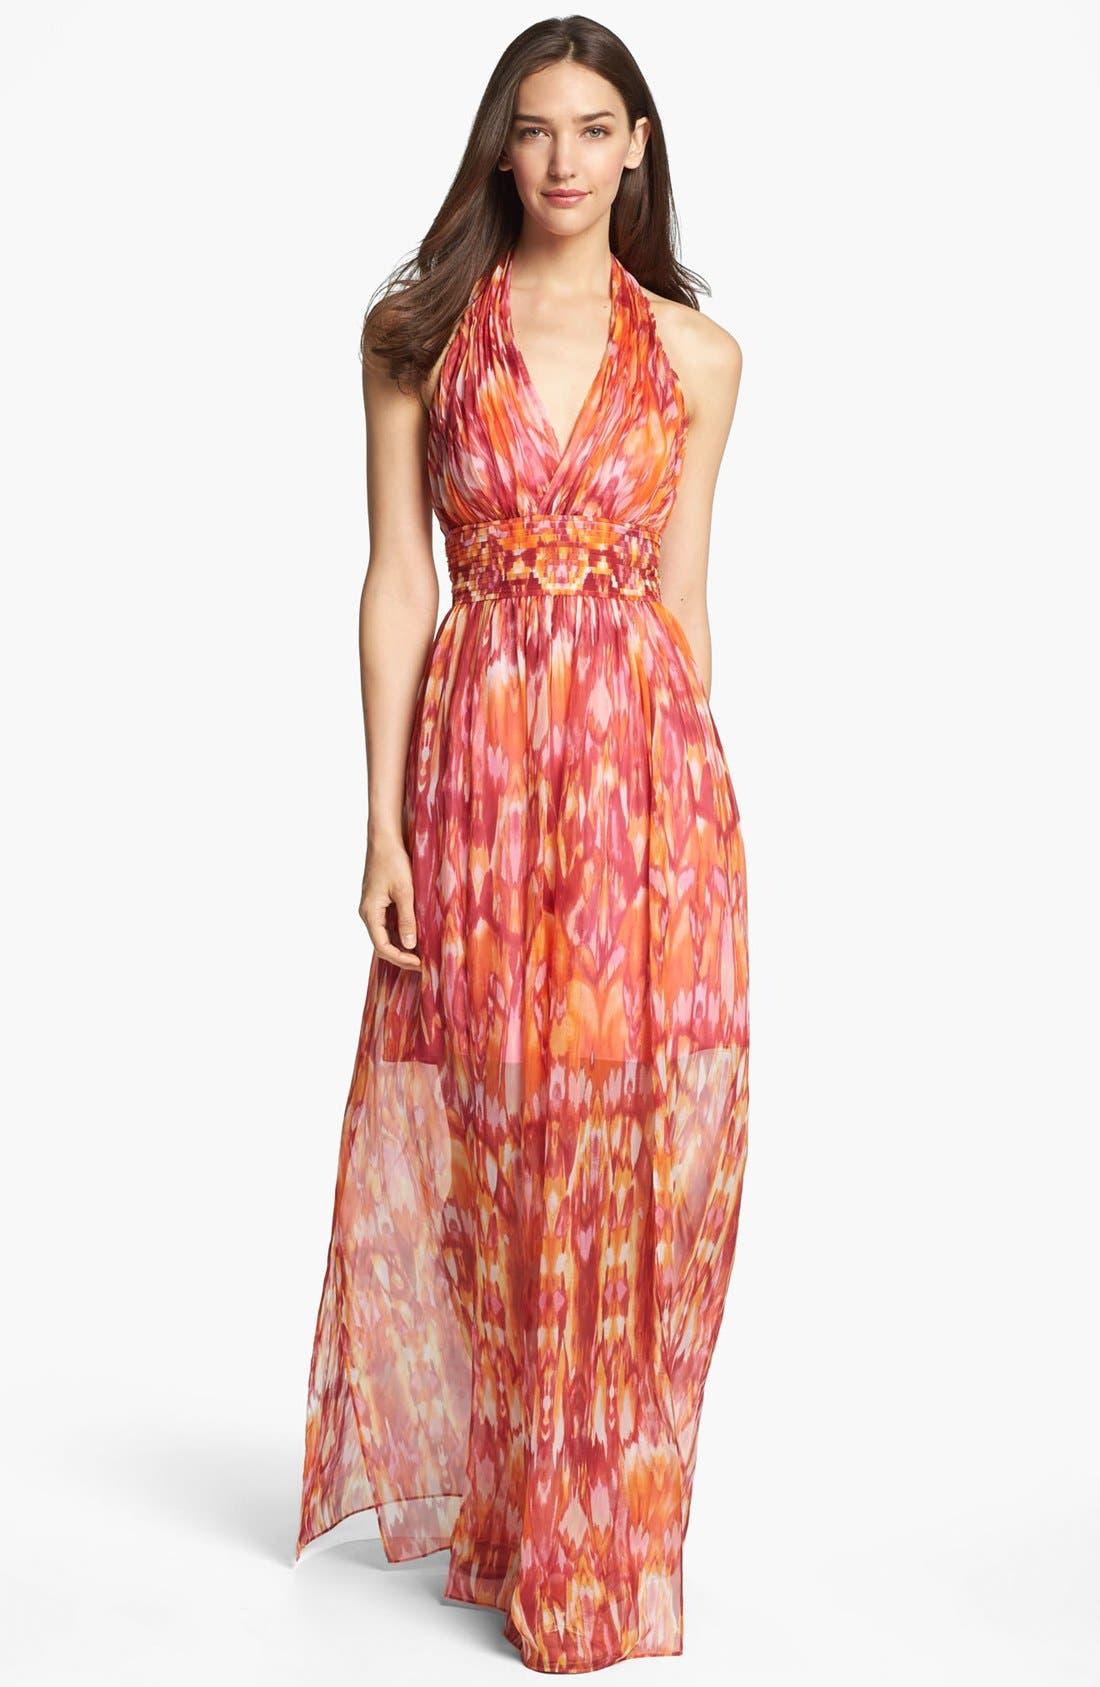 Alternate Image 1 Selected - Laundry by Shelli Segal 'Sun Shadow' Print Halter Dress